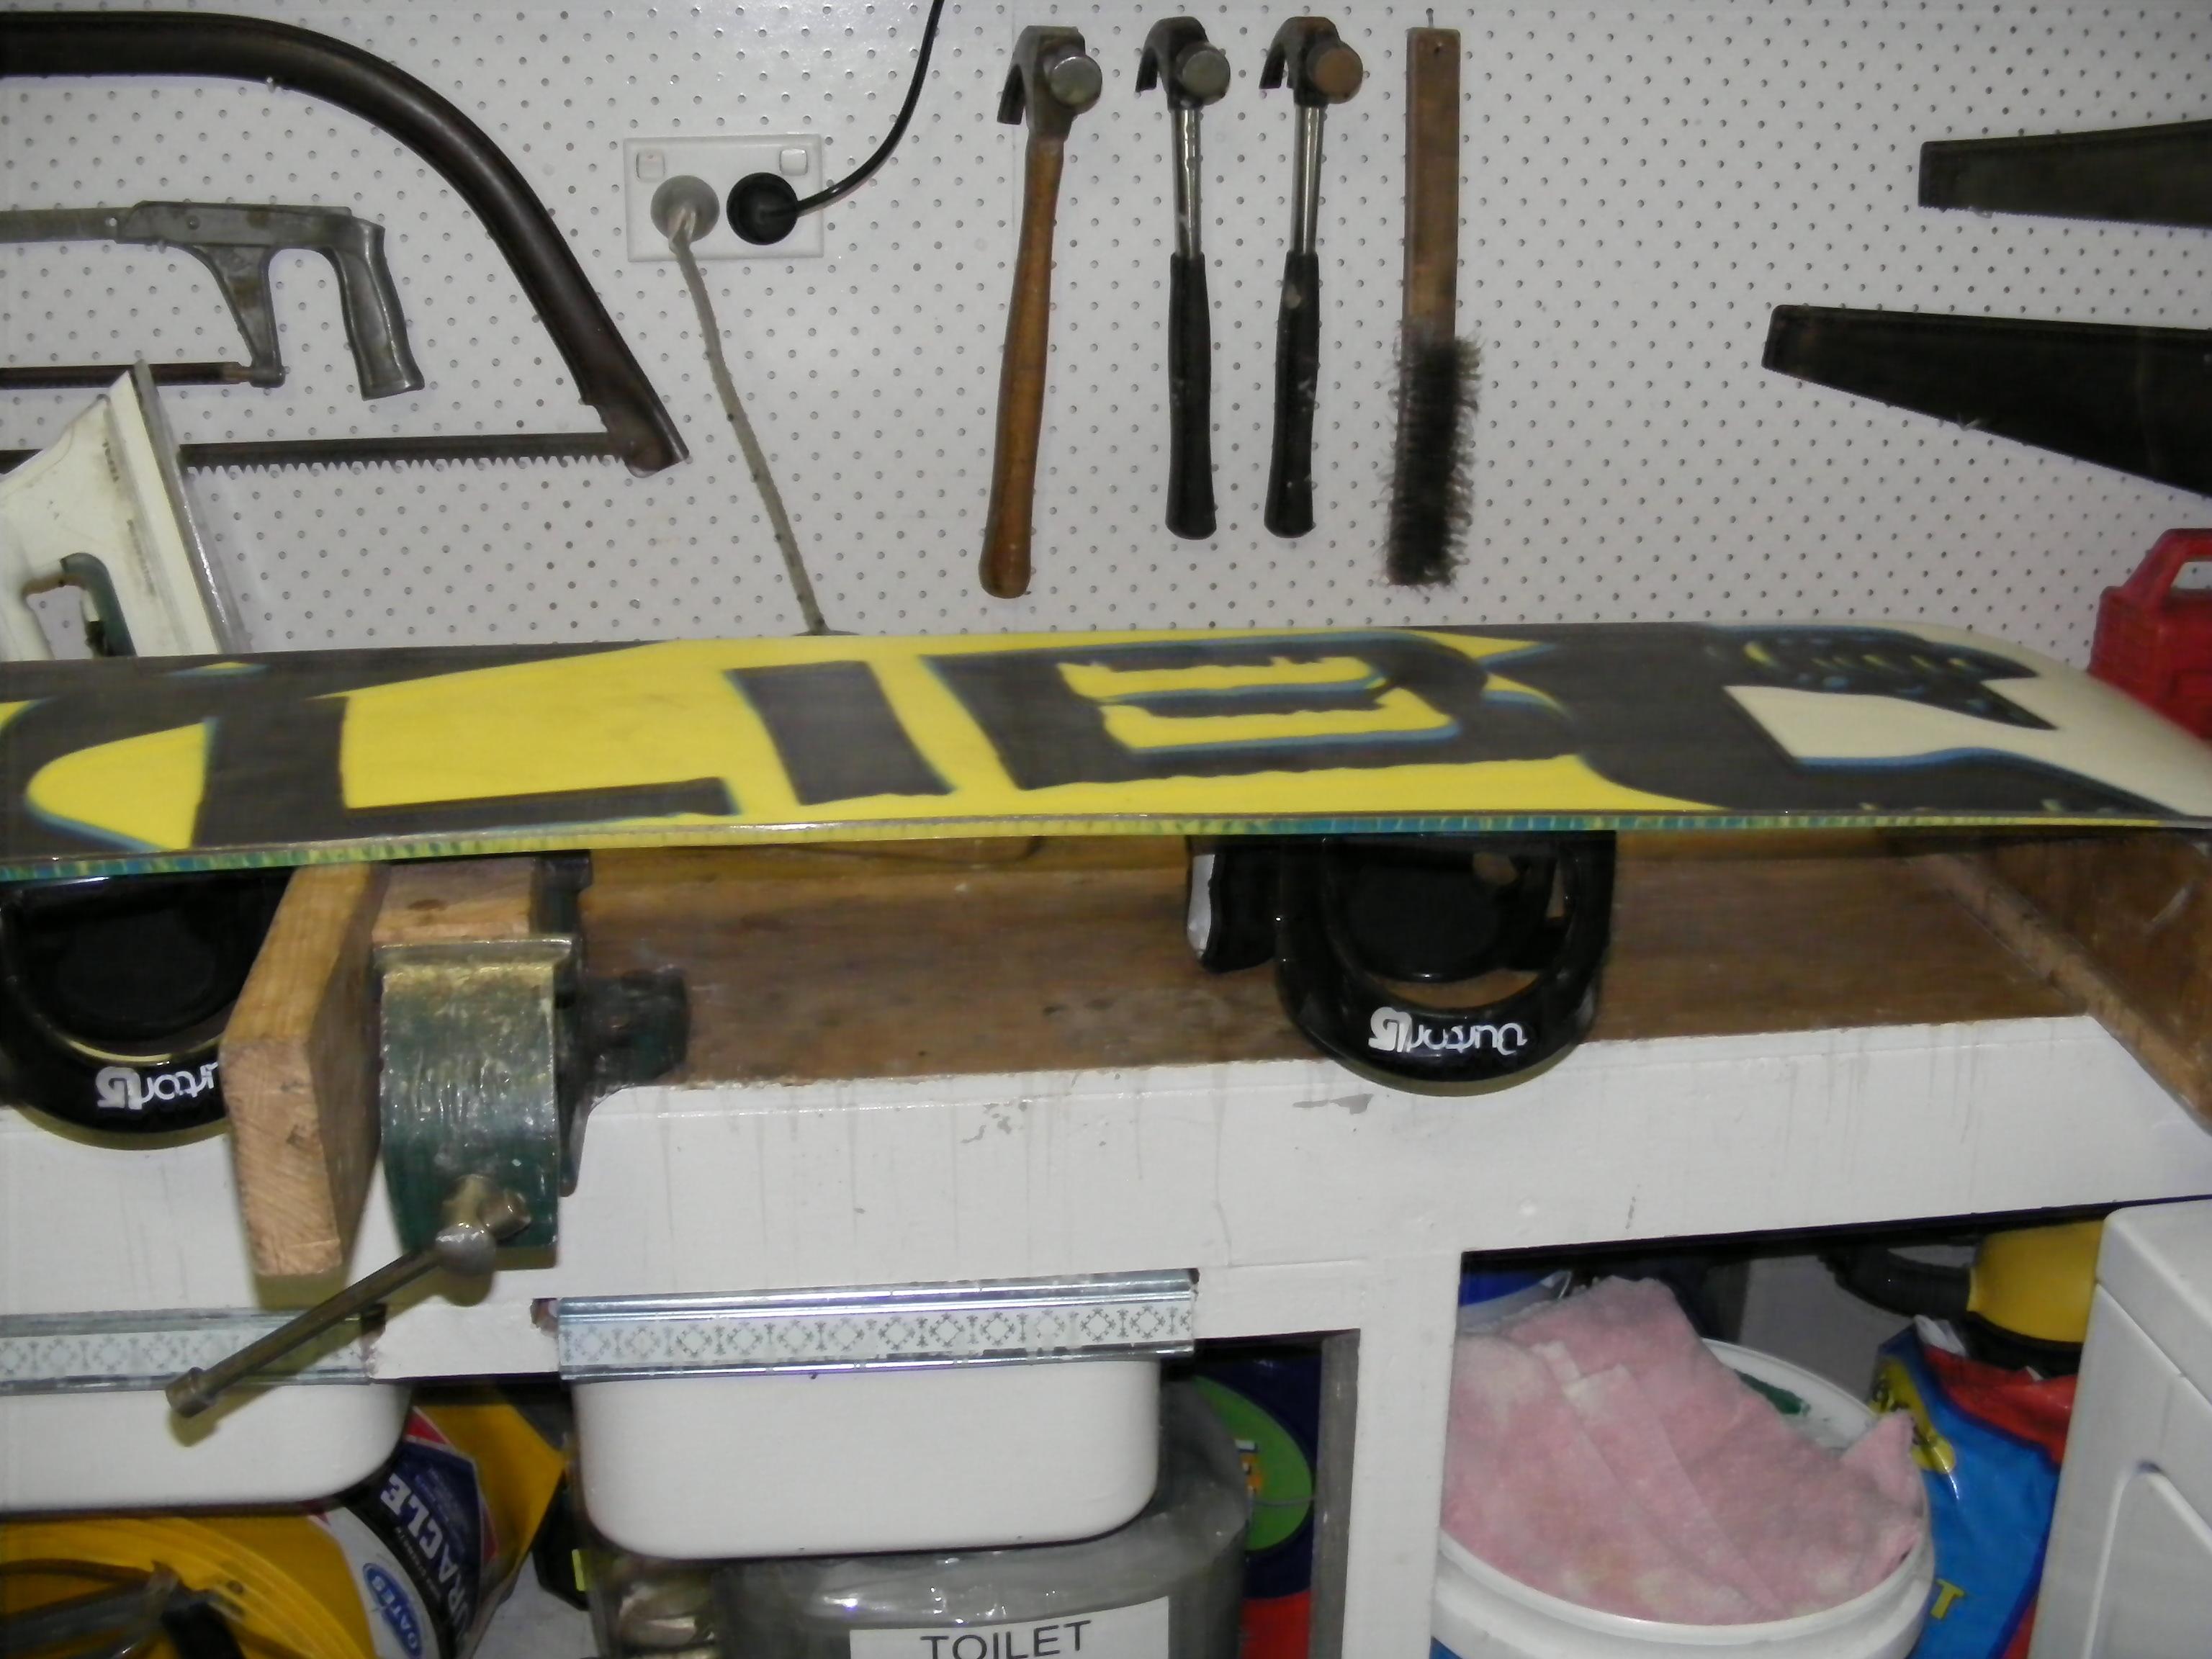 Download Ski Tuning Bench Diy Plans Diy Building A Wood